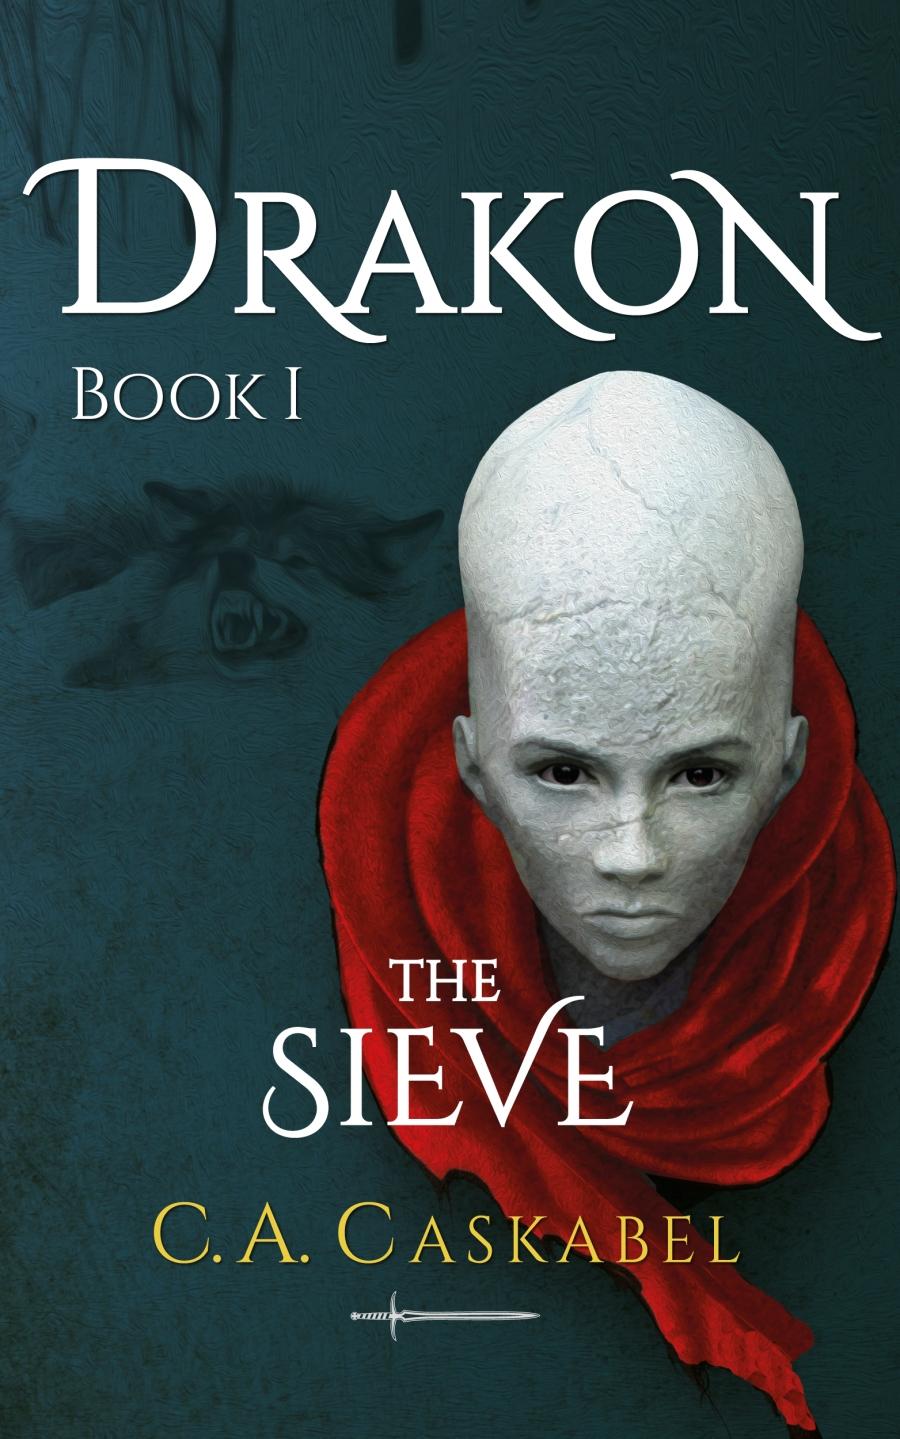 Drakon Book I Cover